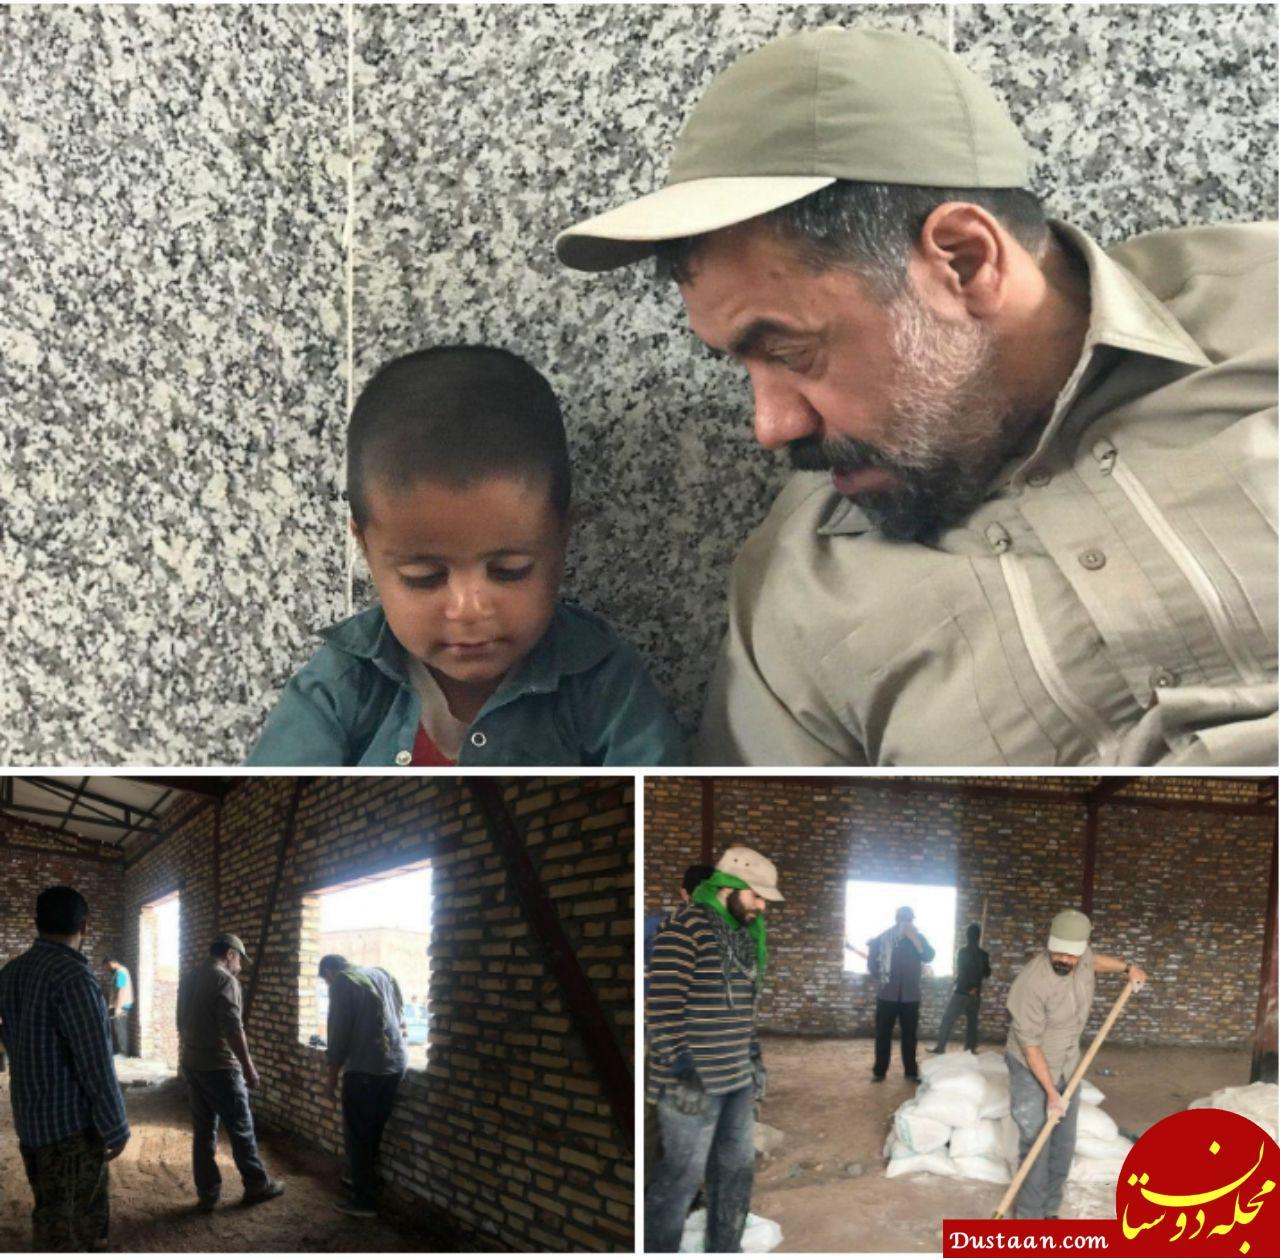 www.dustaan.com حضور حاج محمود کریمی در اردو جهادی +عکس